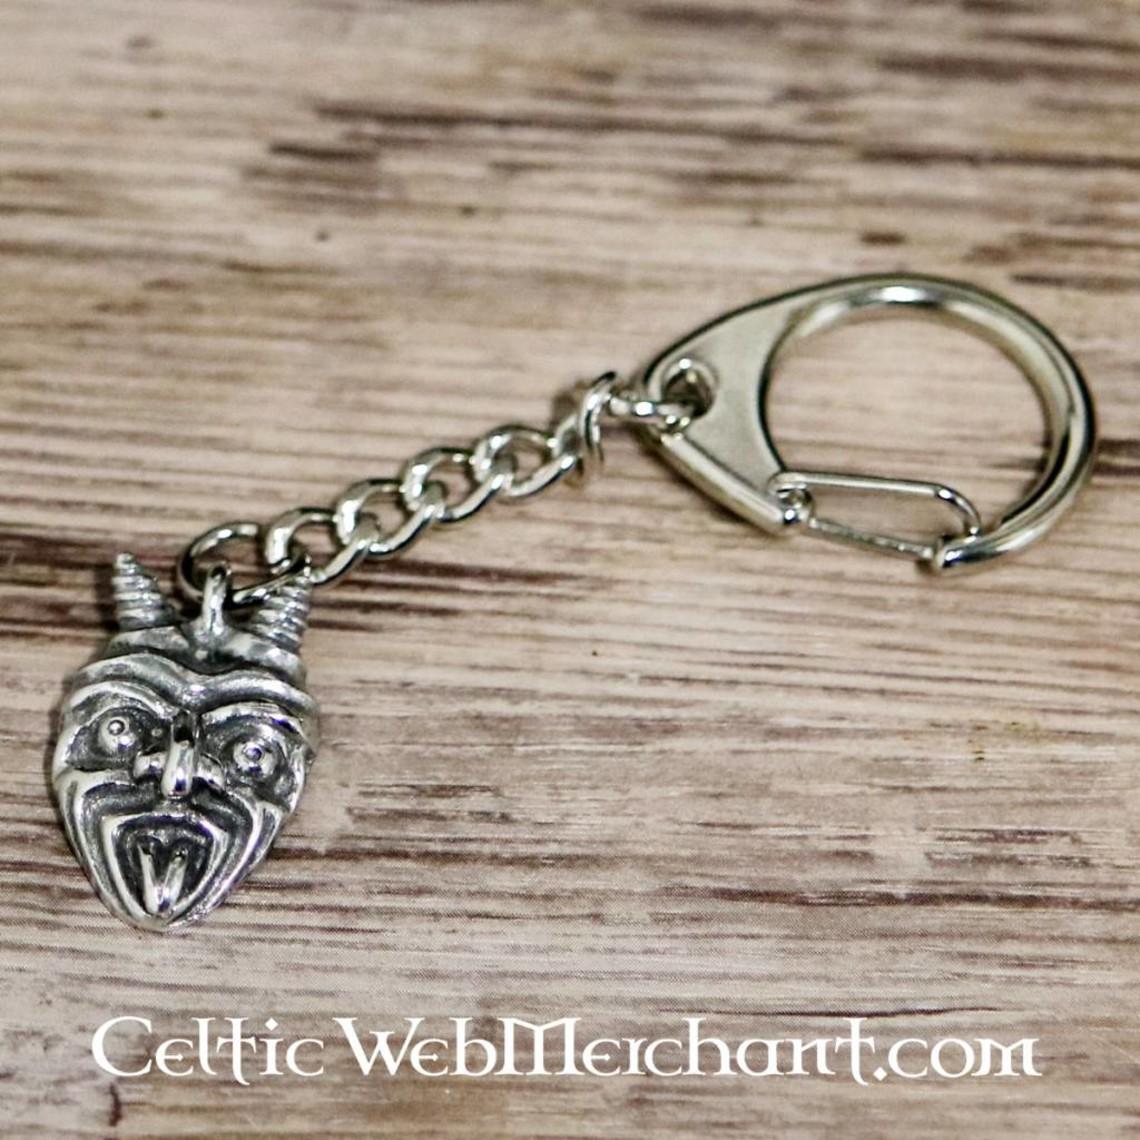 Gargoyle Schlüsselanhänger